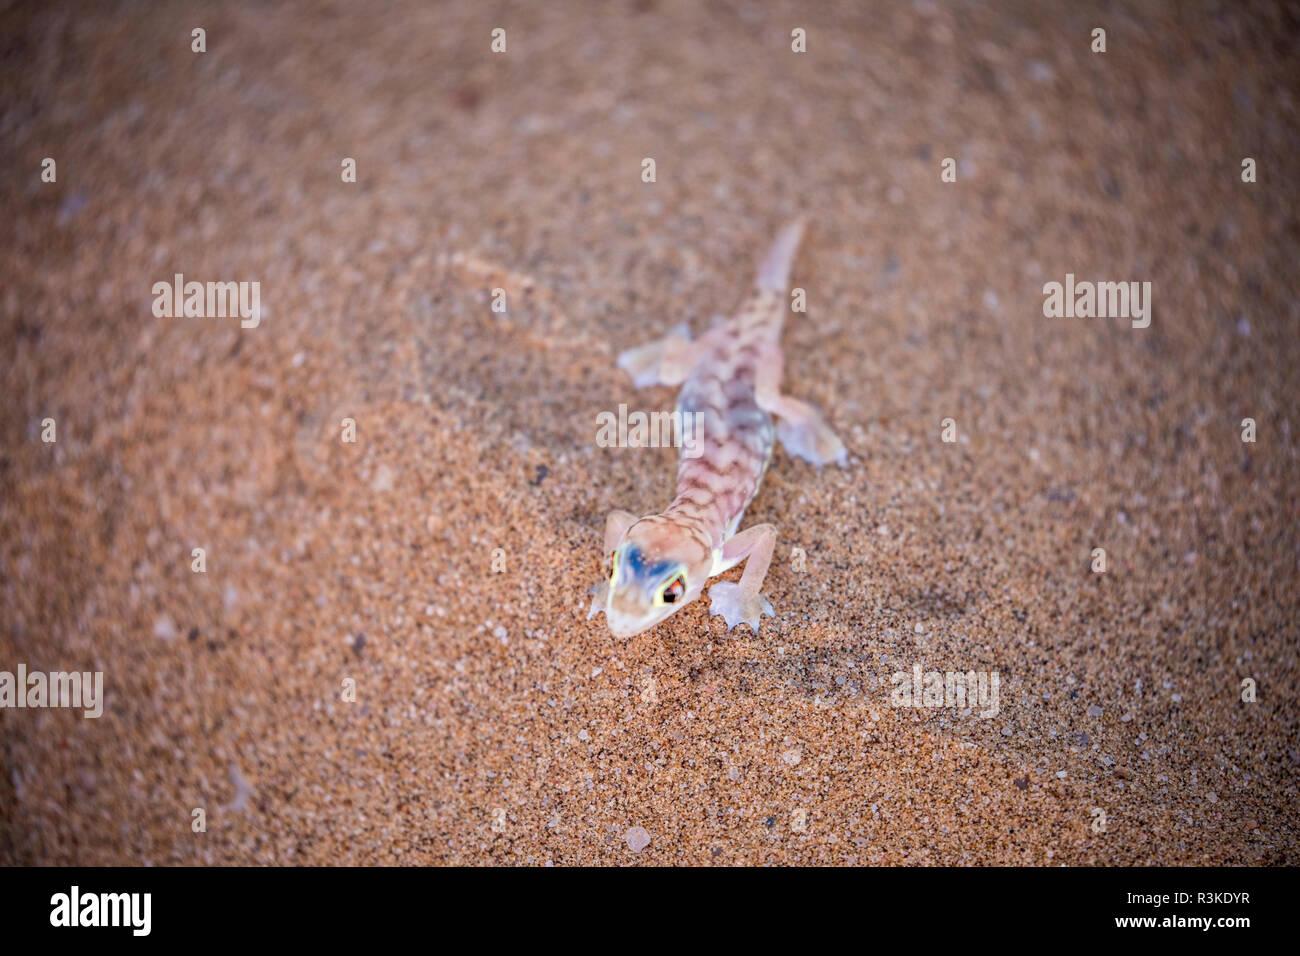 Africa, Namibia, Namib Web-footed Gecko in Desert outside Swakopmund Stock Photo